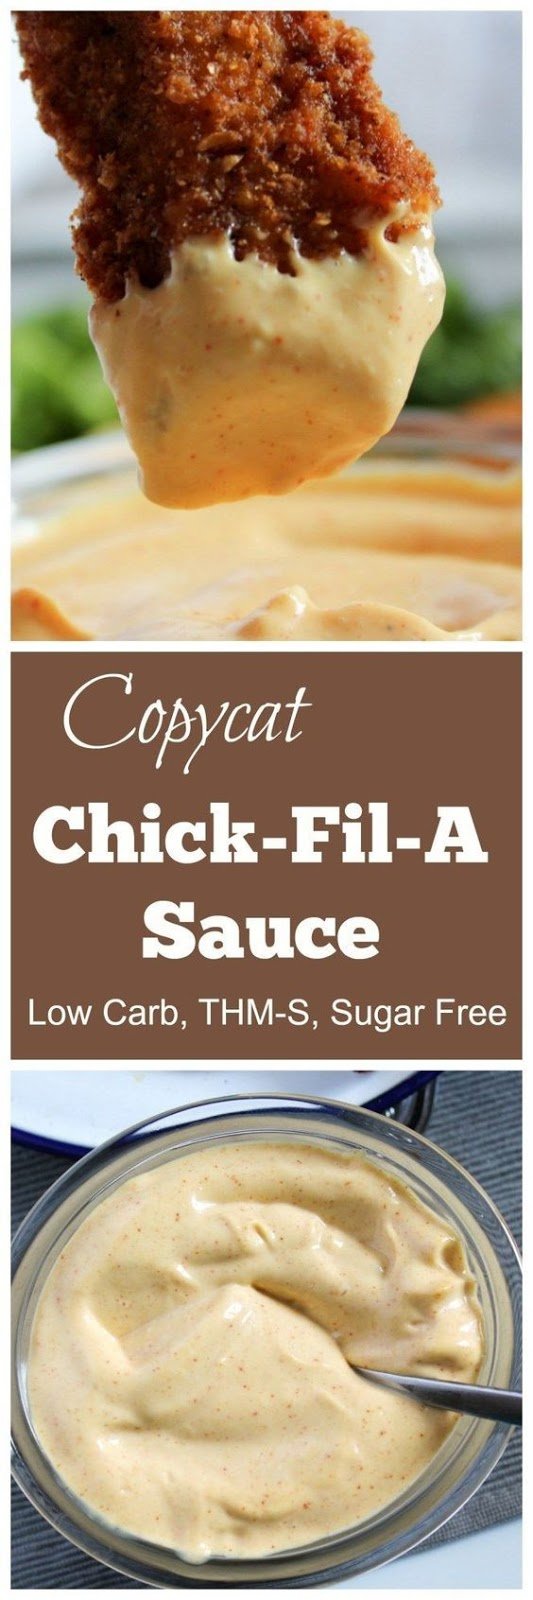 Copycat Chick-Fil-A Sauce (THM-S, Low Carb, Sugar Free)